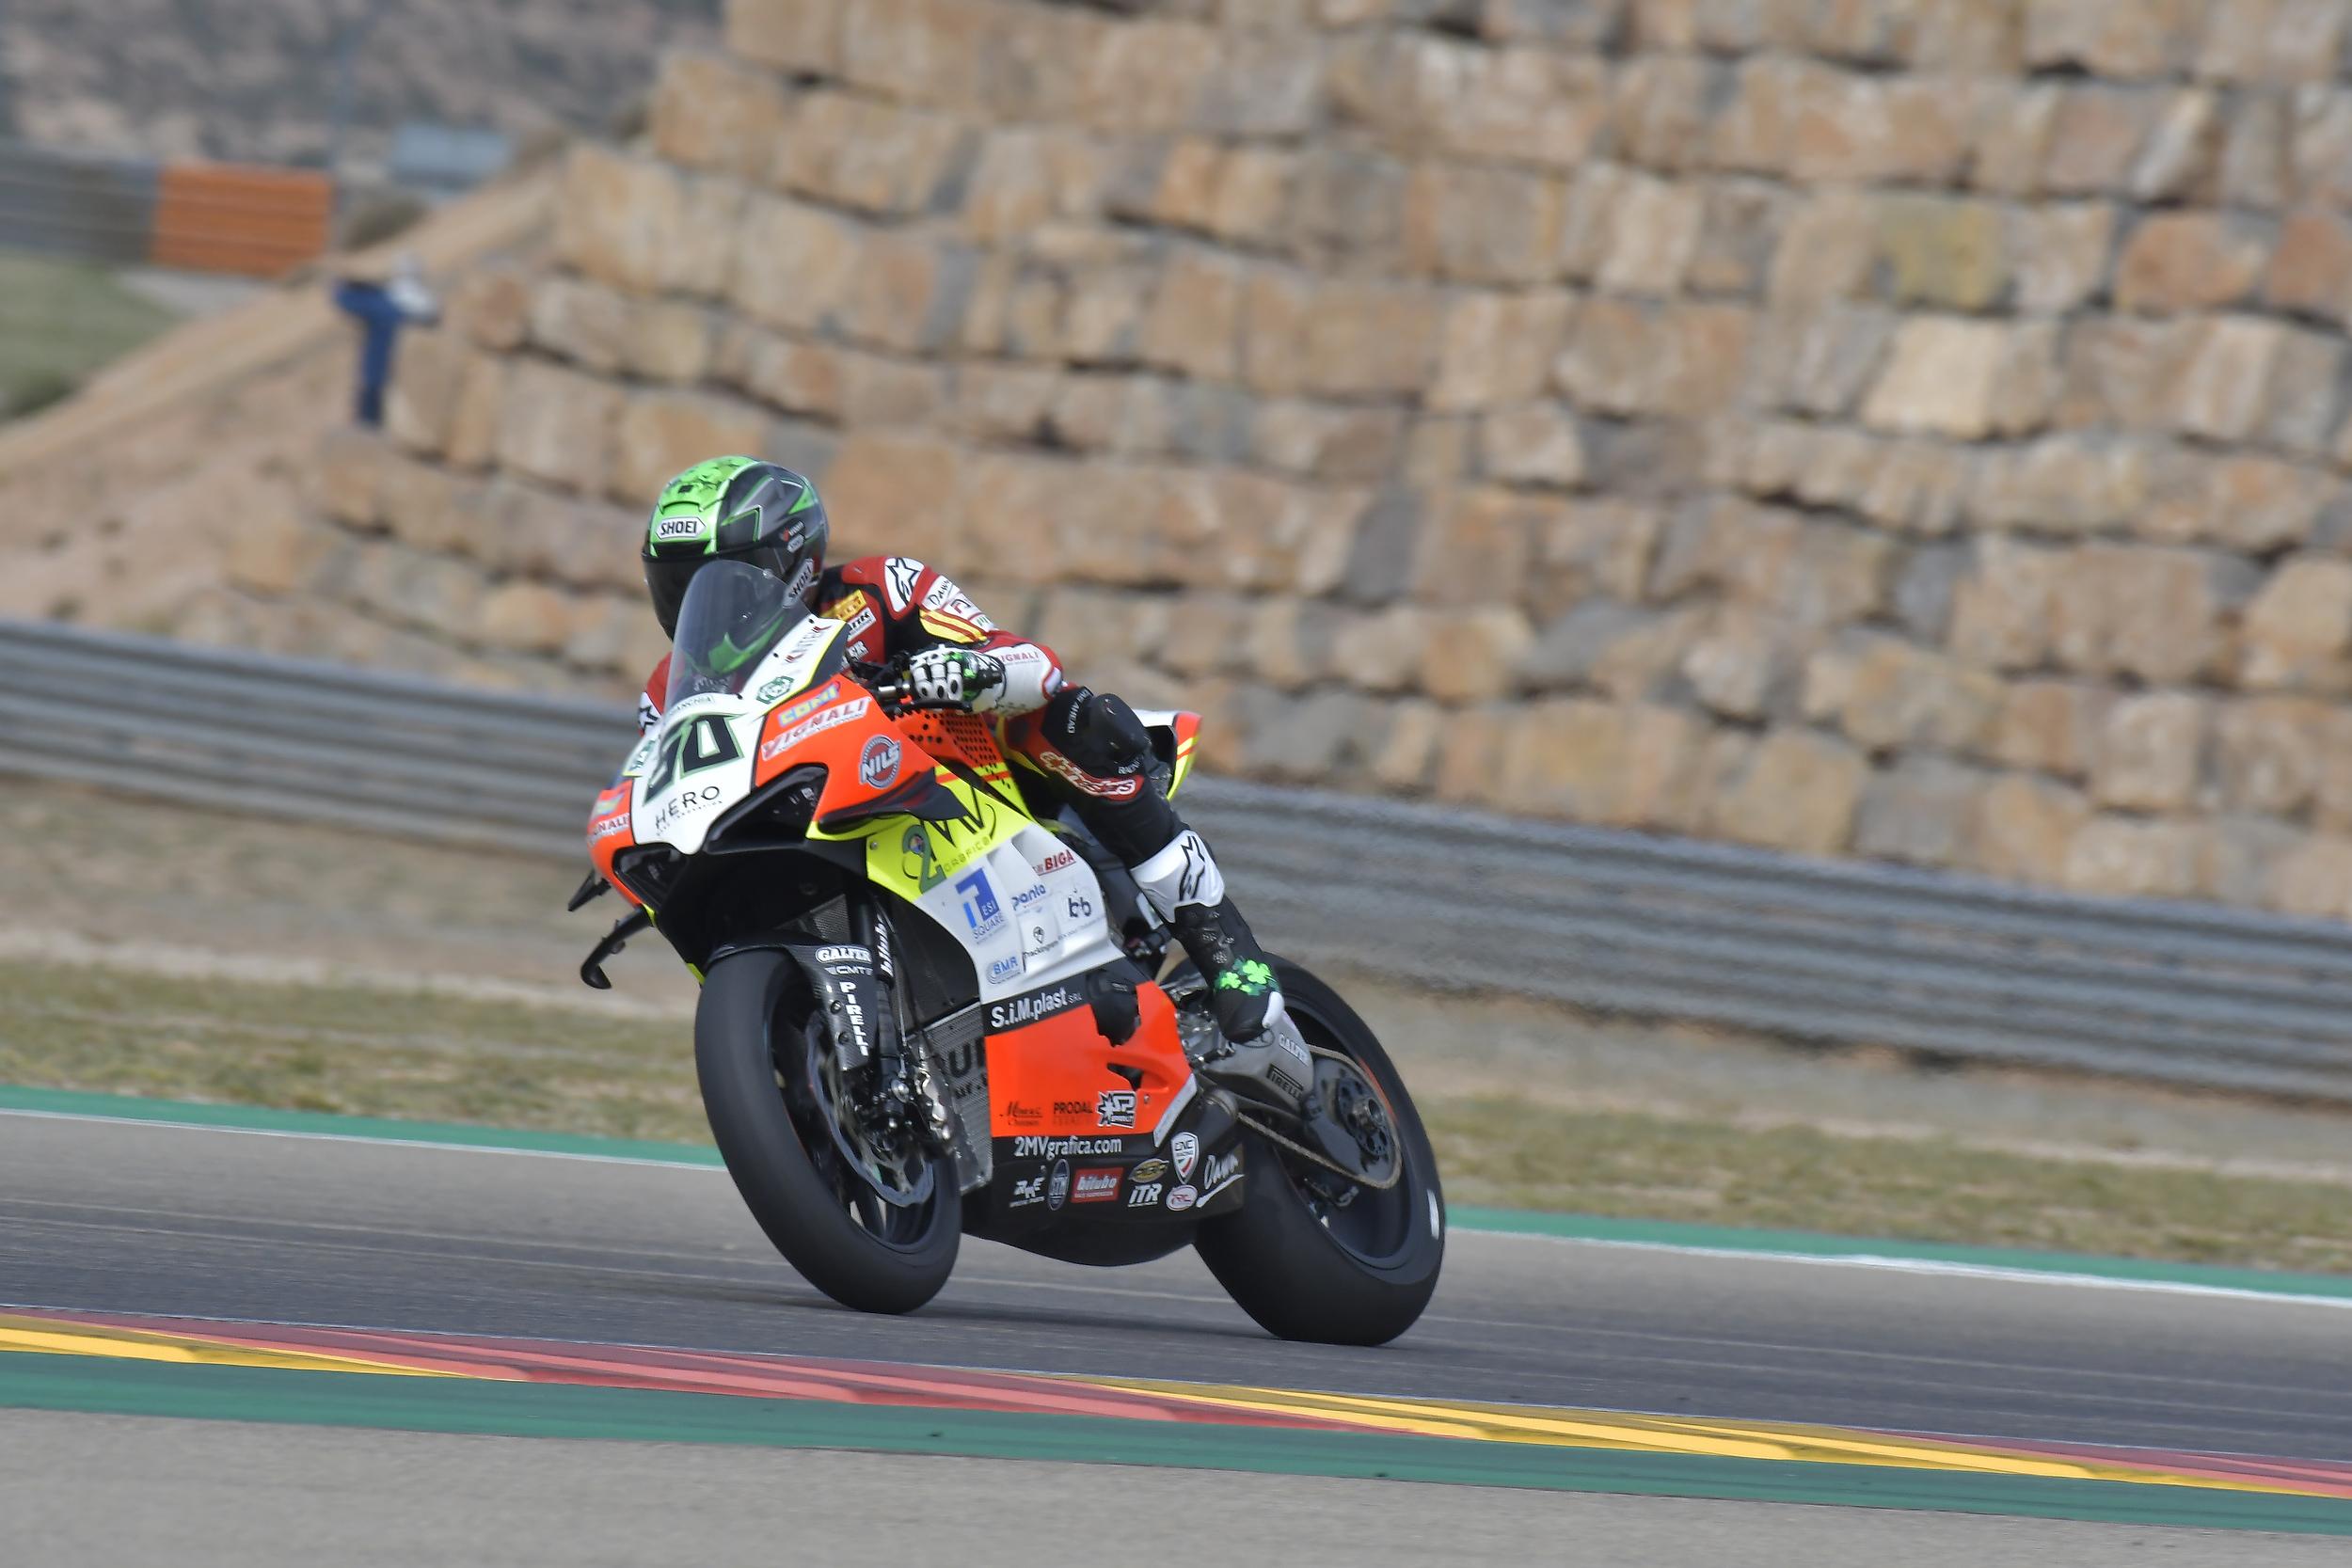 WSBK 2019 3 Round - Motocard Aragon